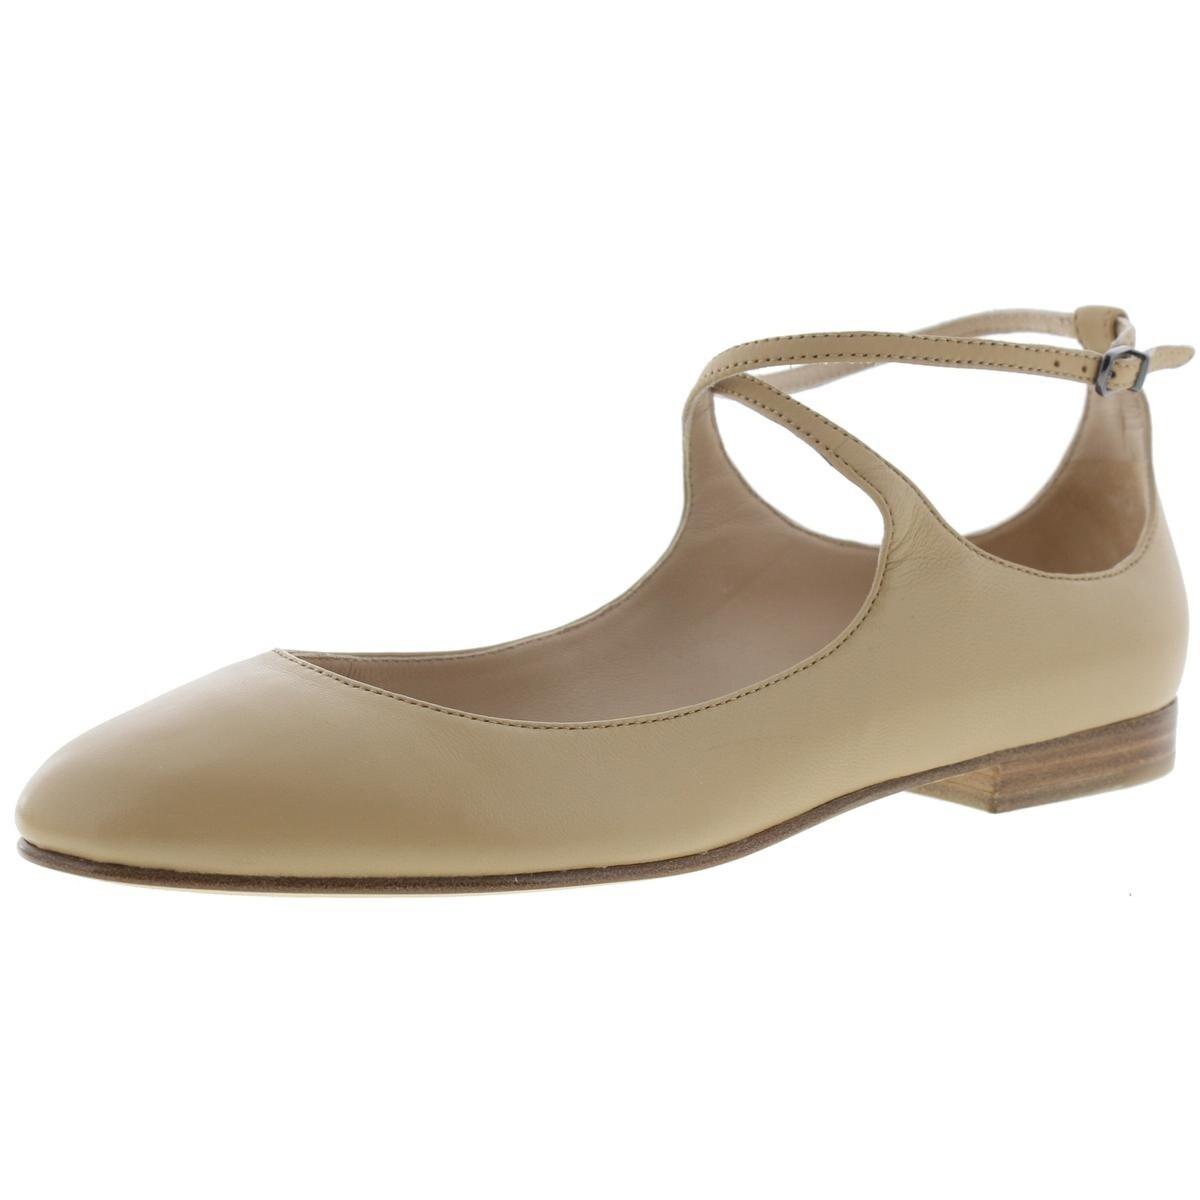 86dd2b6d5fb18 Via Spiga Womens Yovela Ballet Flats Criss-Cross Front